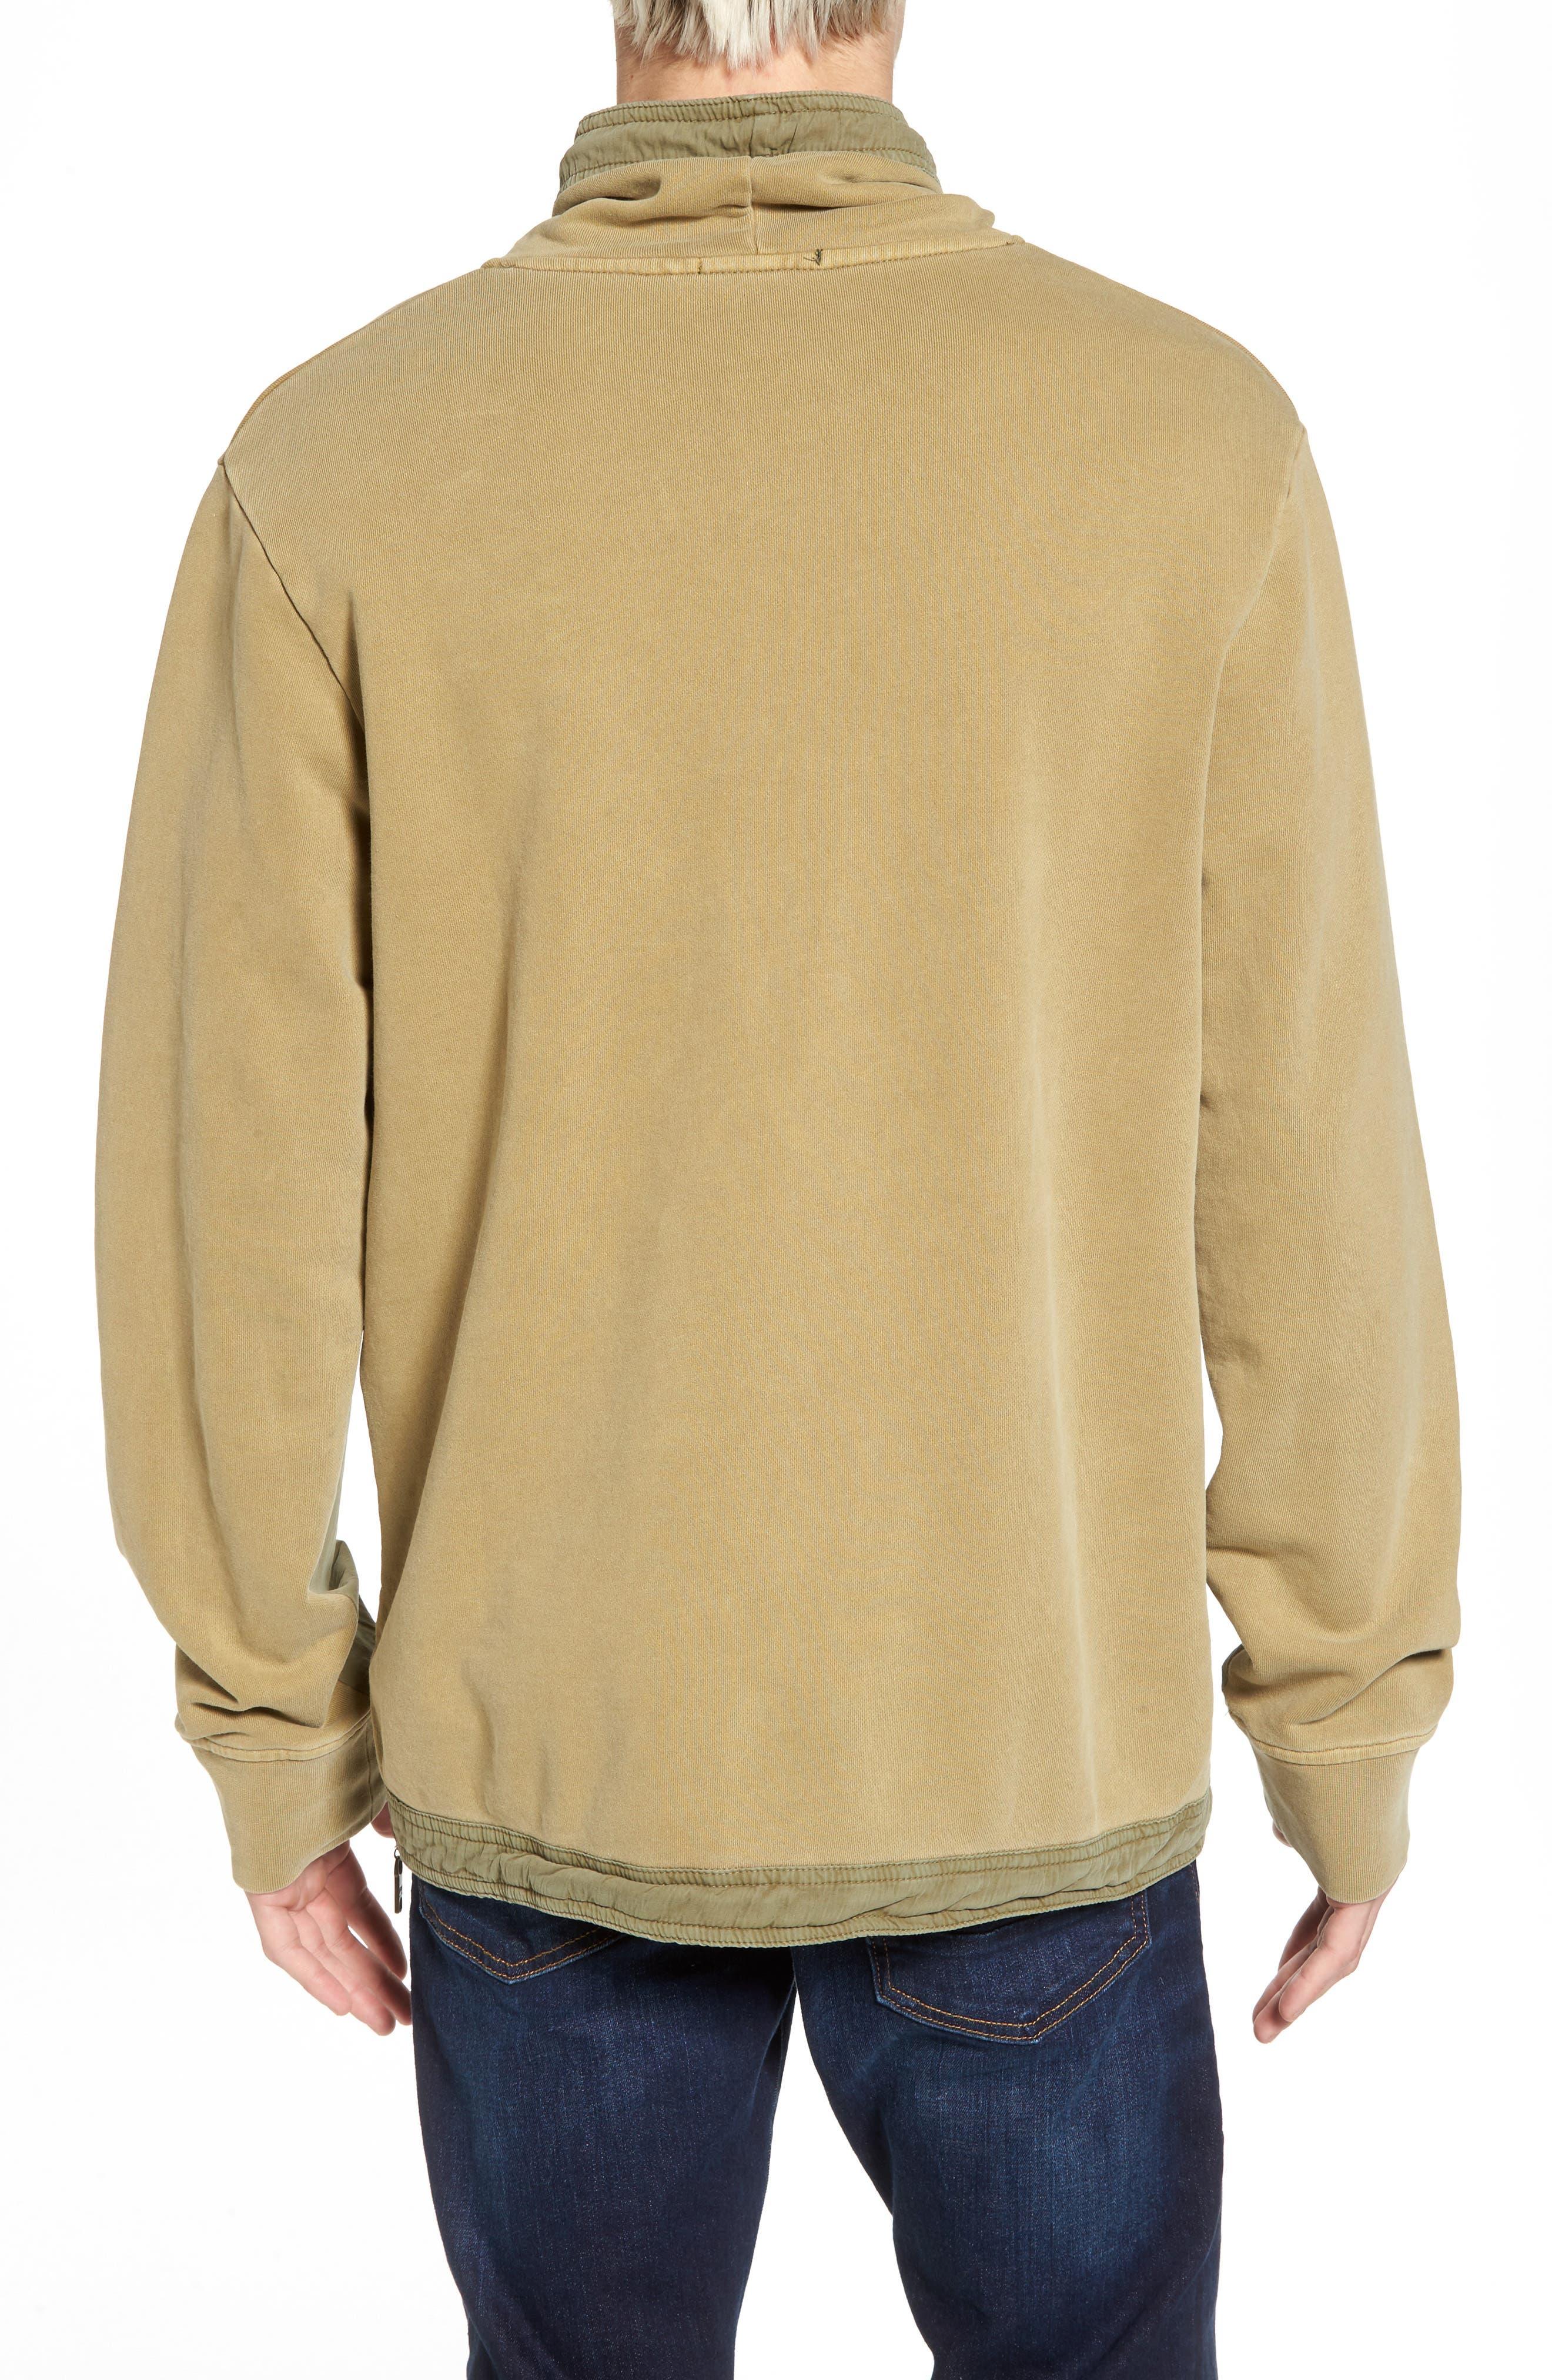 Garment Dyed Sweatshirt,                             Alternate thumbnail 2, color,                             700